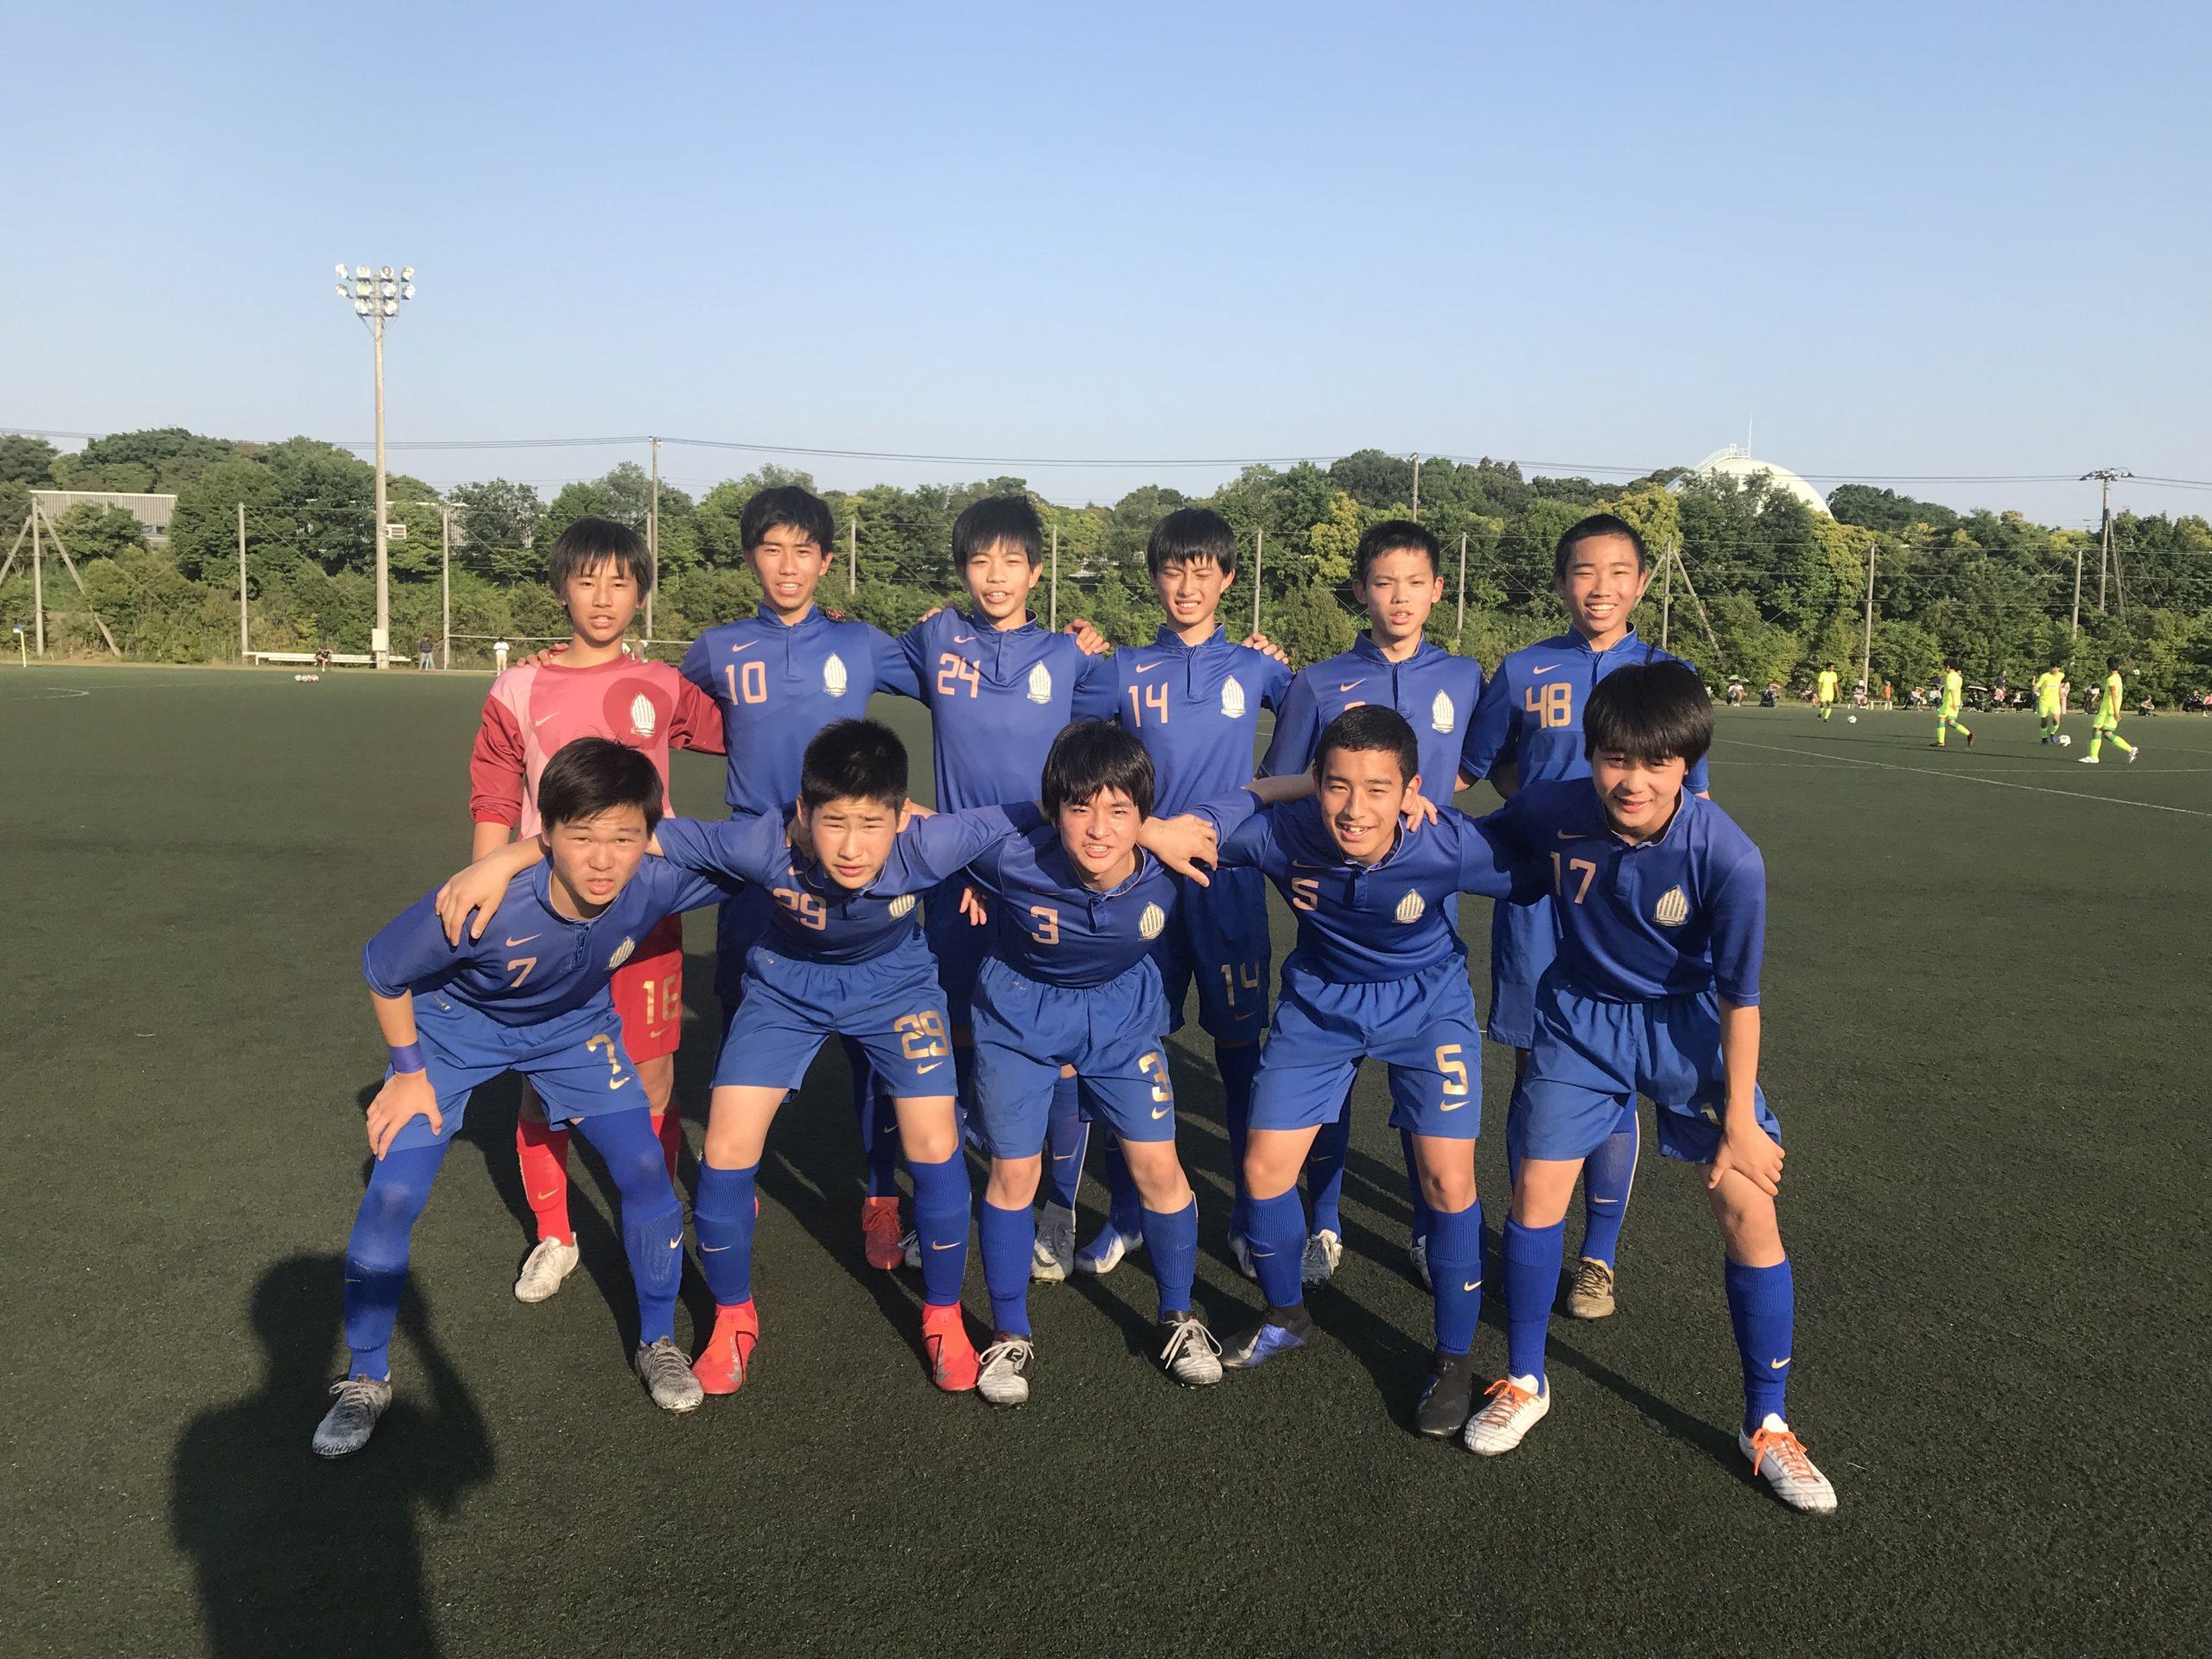 【U15】U-15クラブユース選手権 準決勝